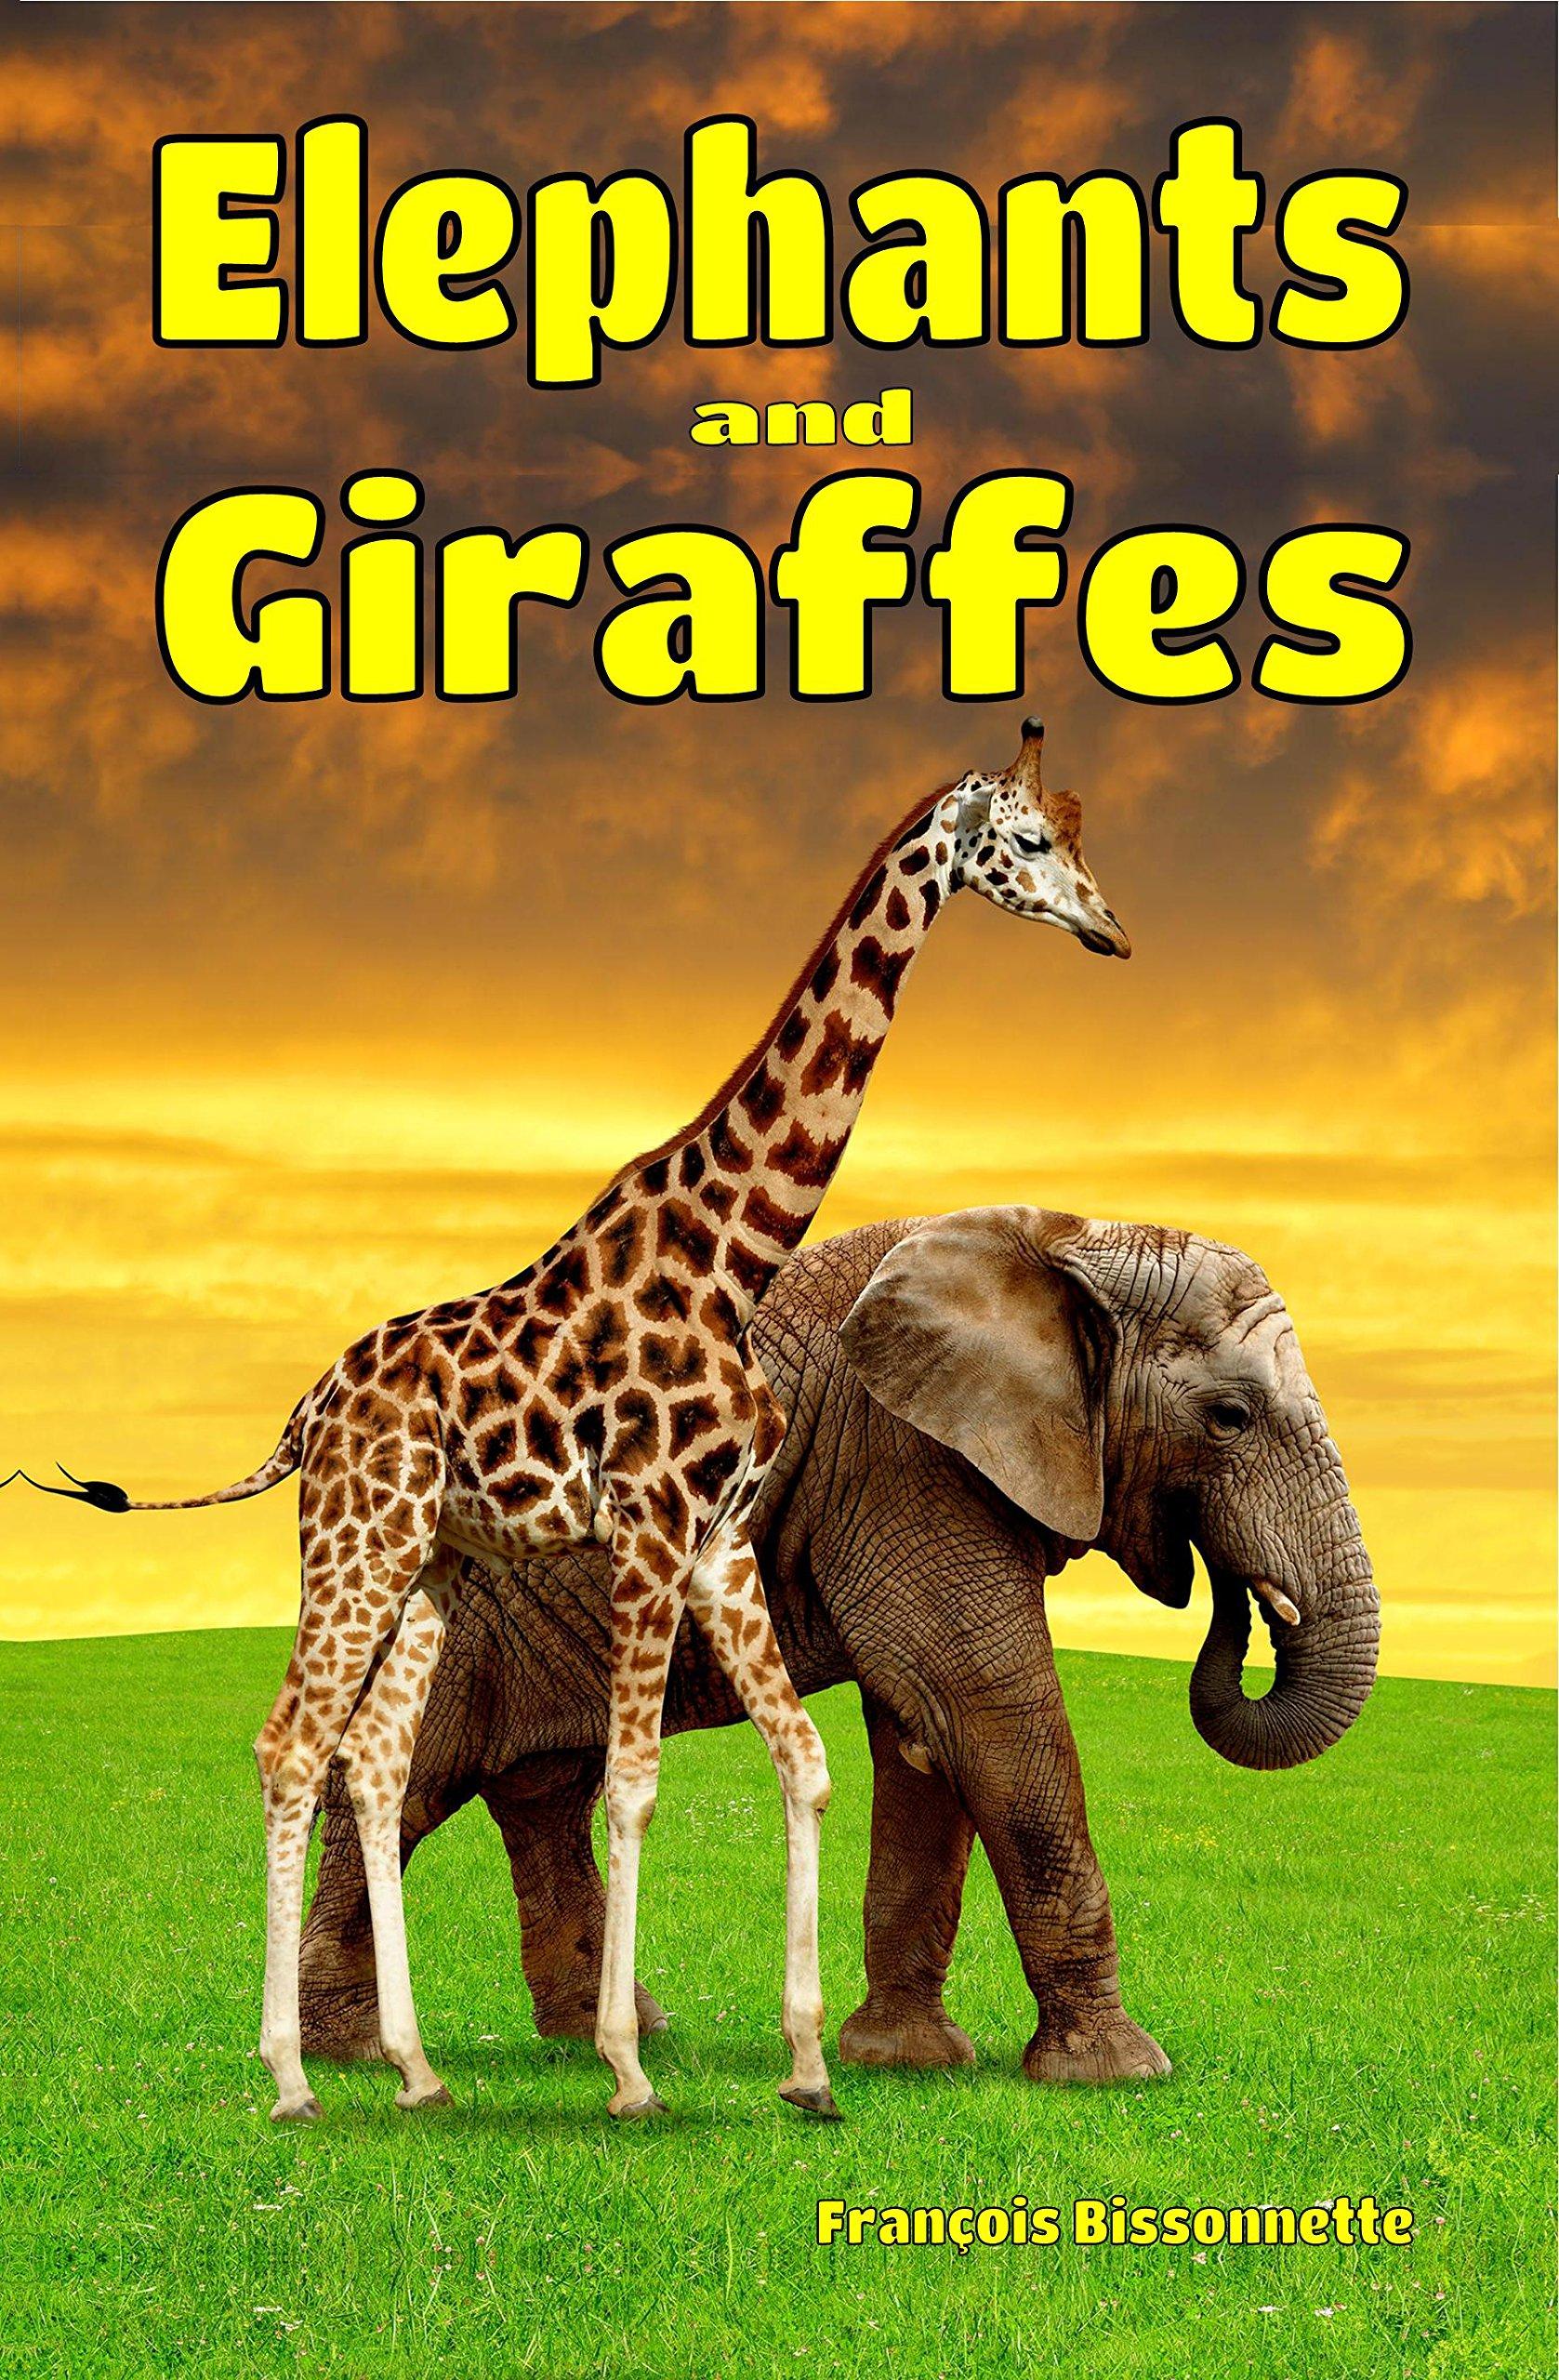 reviews children s books elephants and giraffes facts